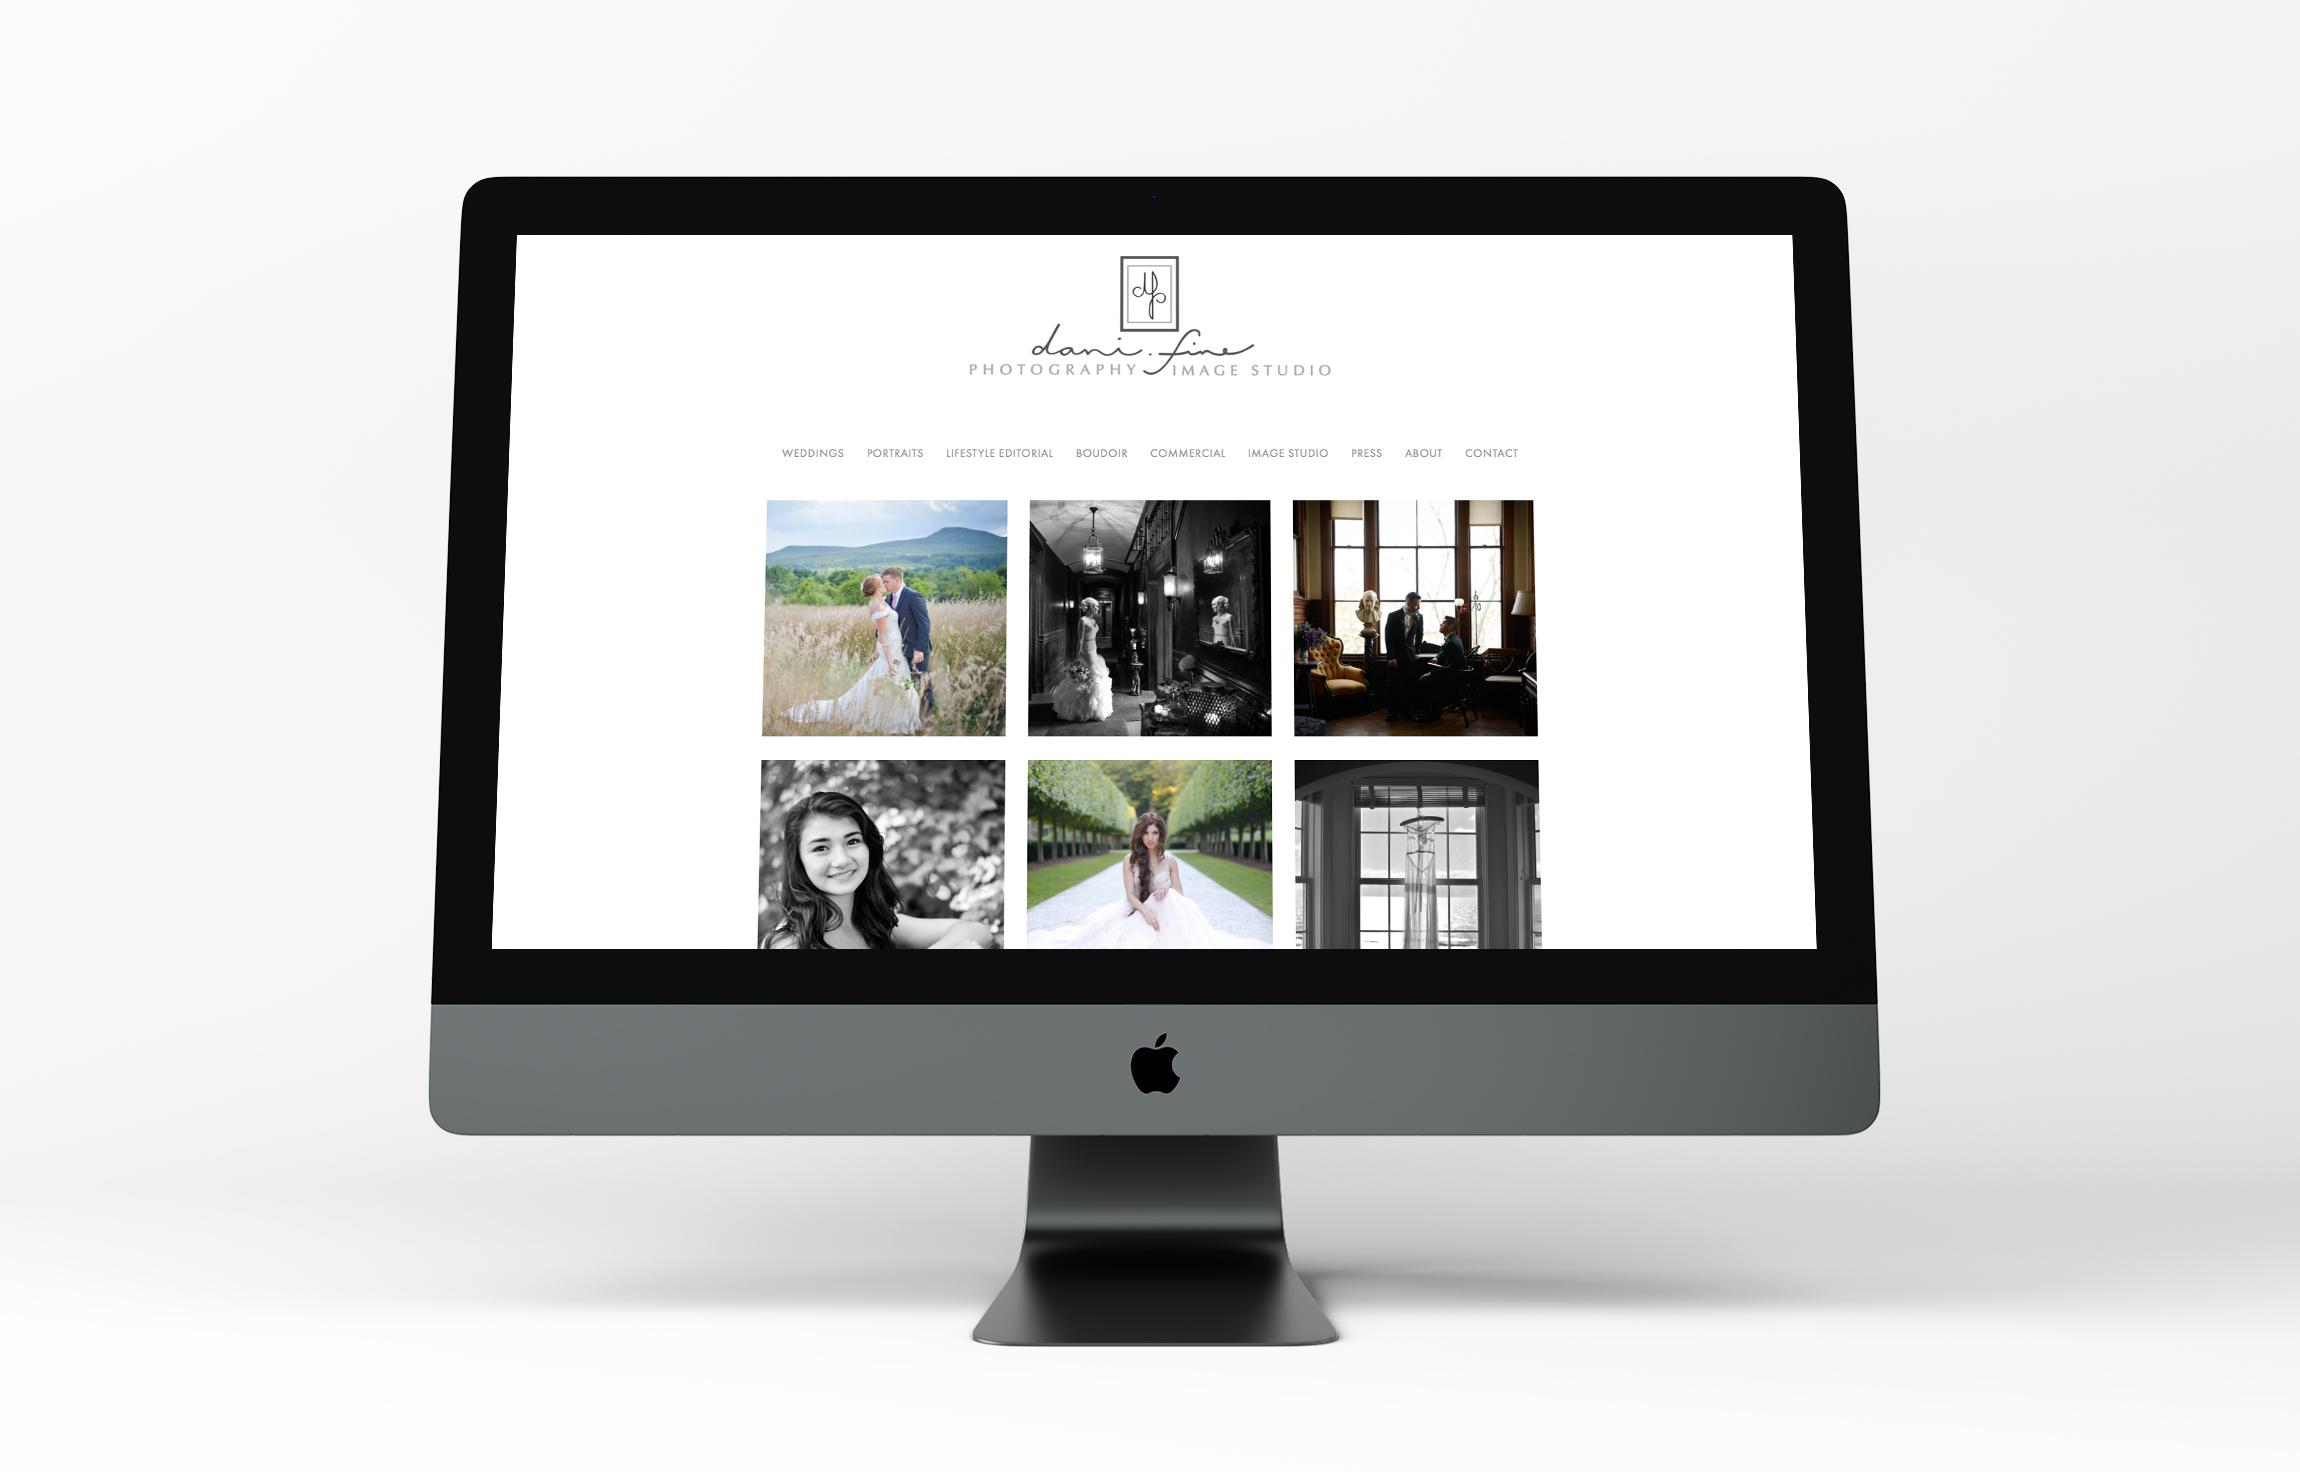 dani. fine photography & image studio